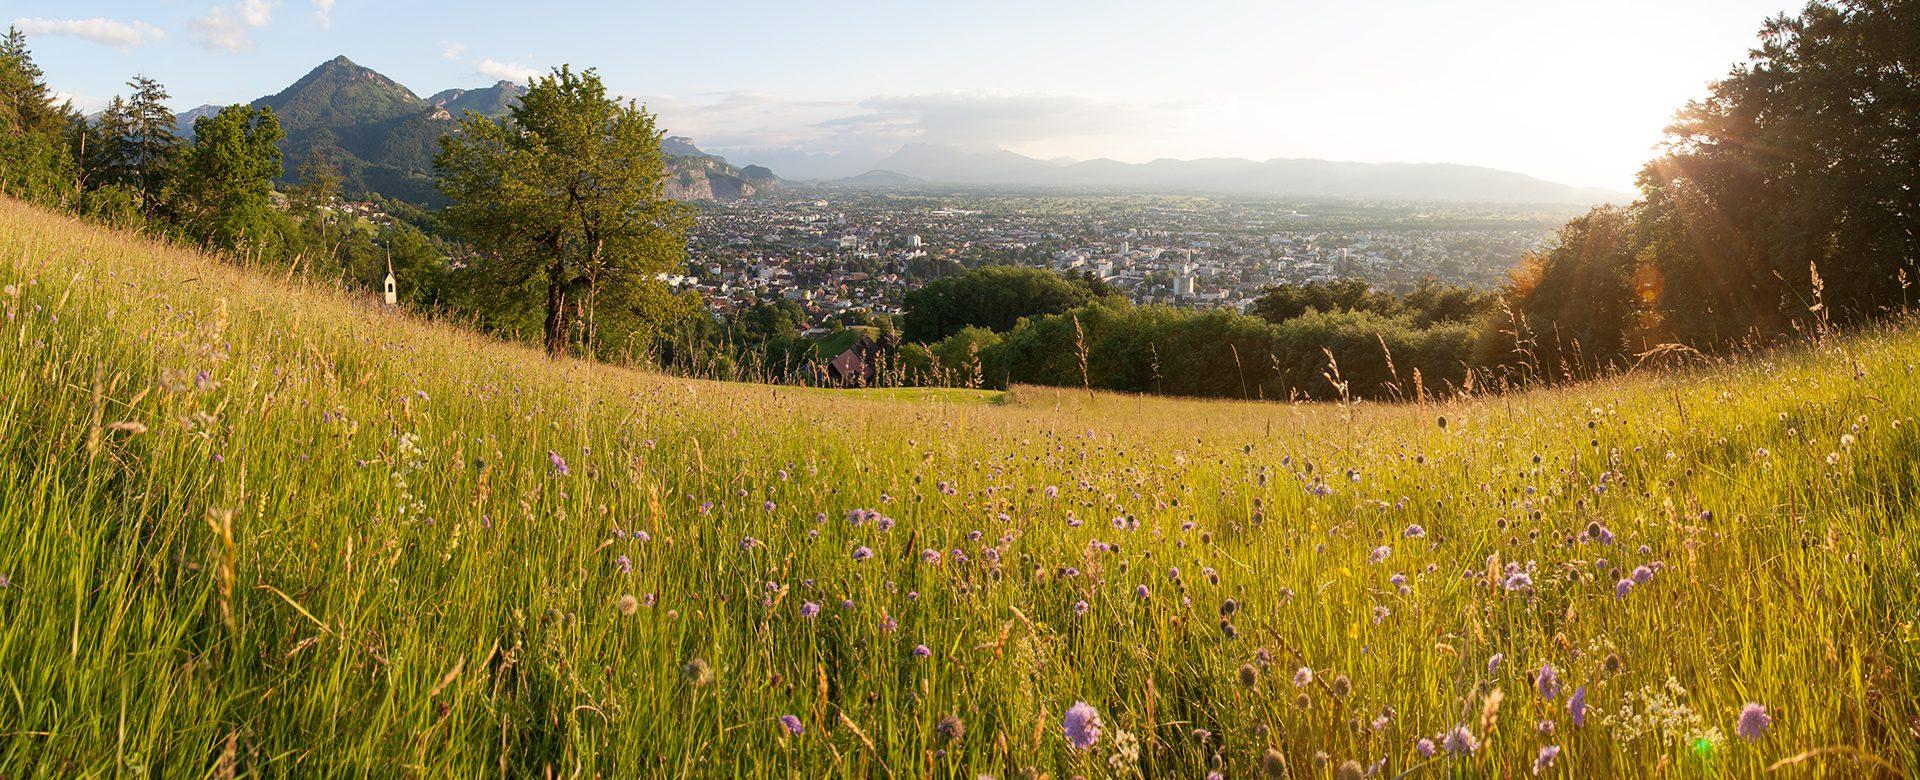 Sommer Vorarlberg VLV